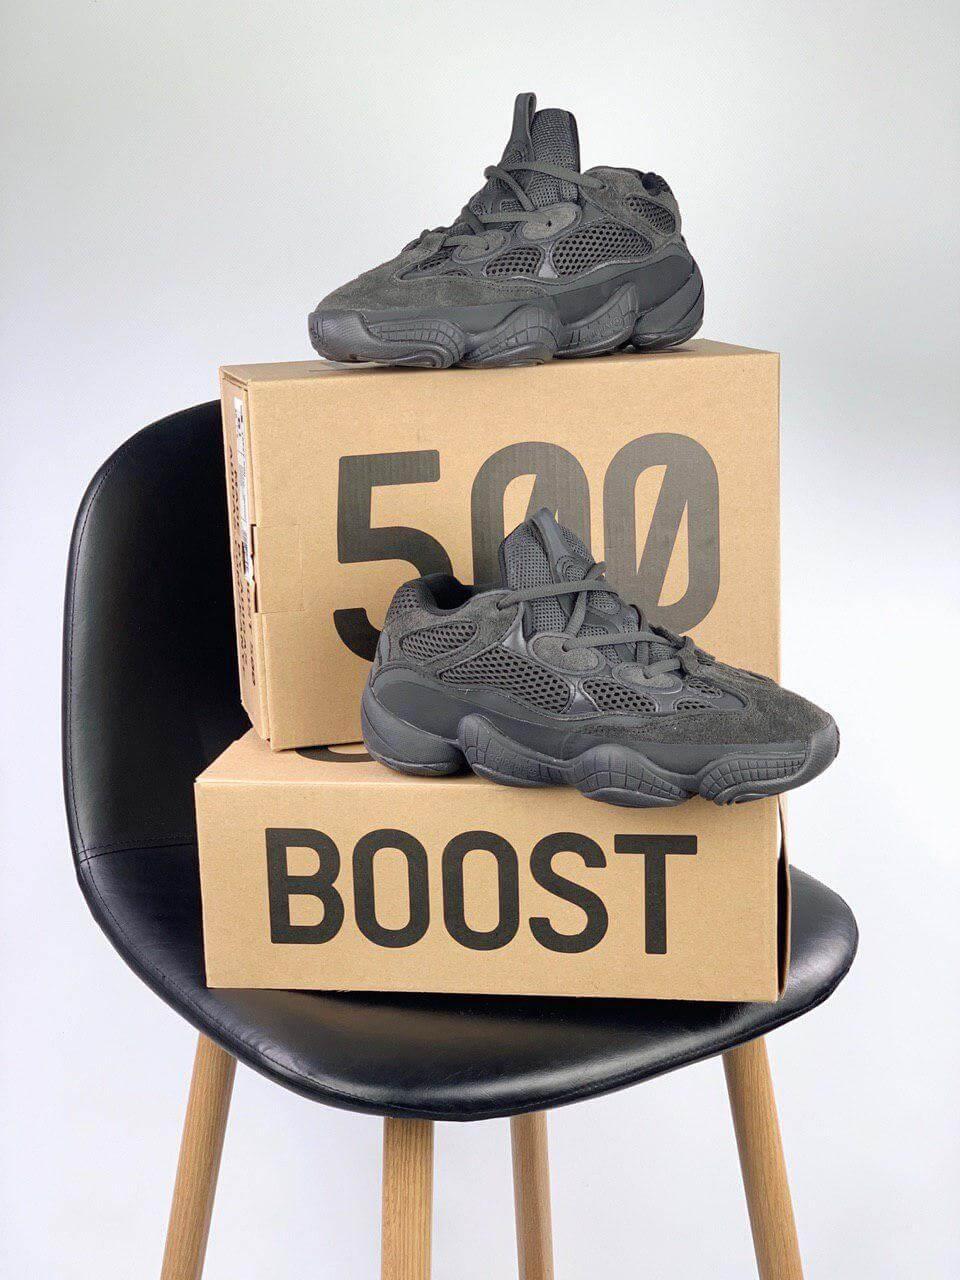 best sneakers aad14 1fc0f Кроссовки Adidas Yeezy 500 Black , цена 1 675 грн., купить в Киеве —  Prom.ua (ID 262987857)